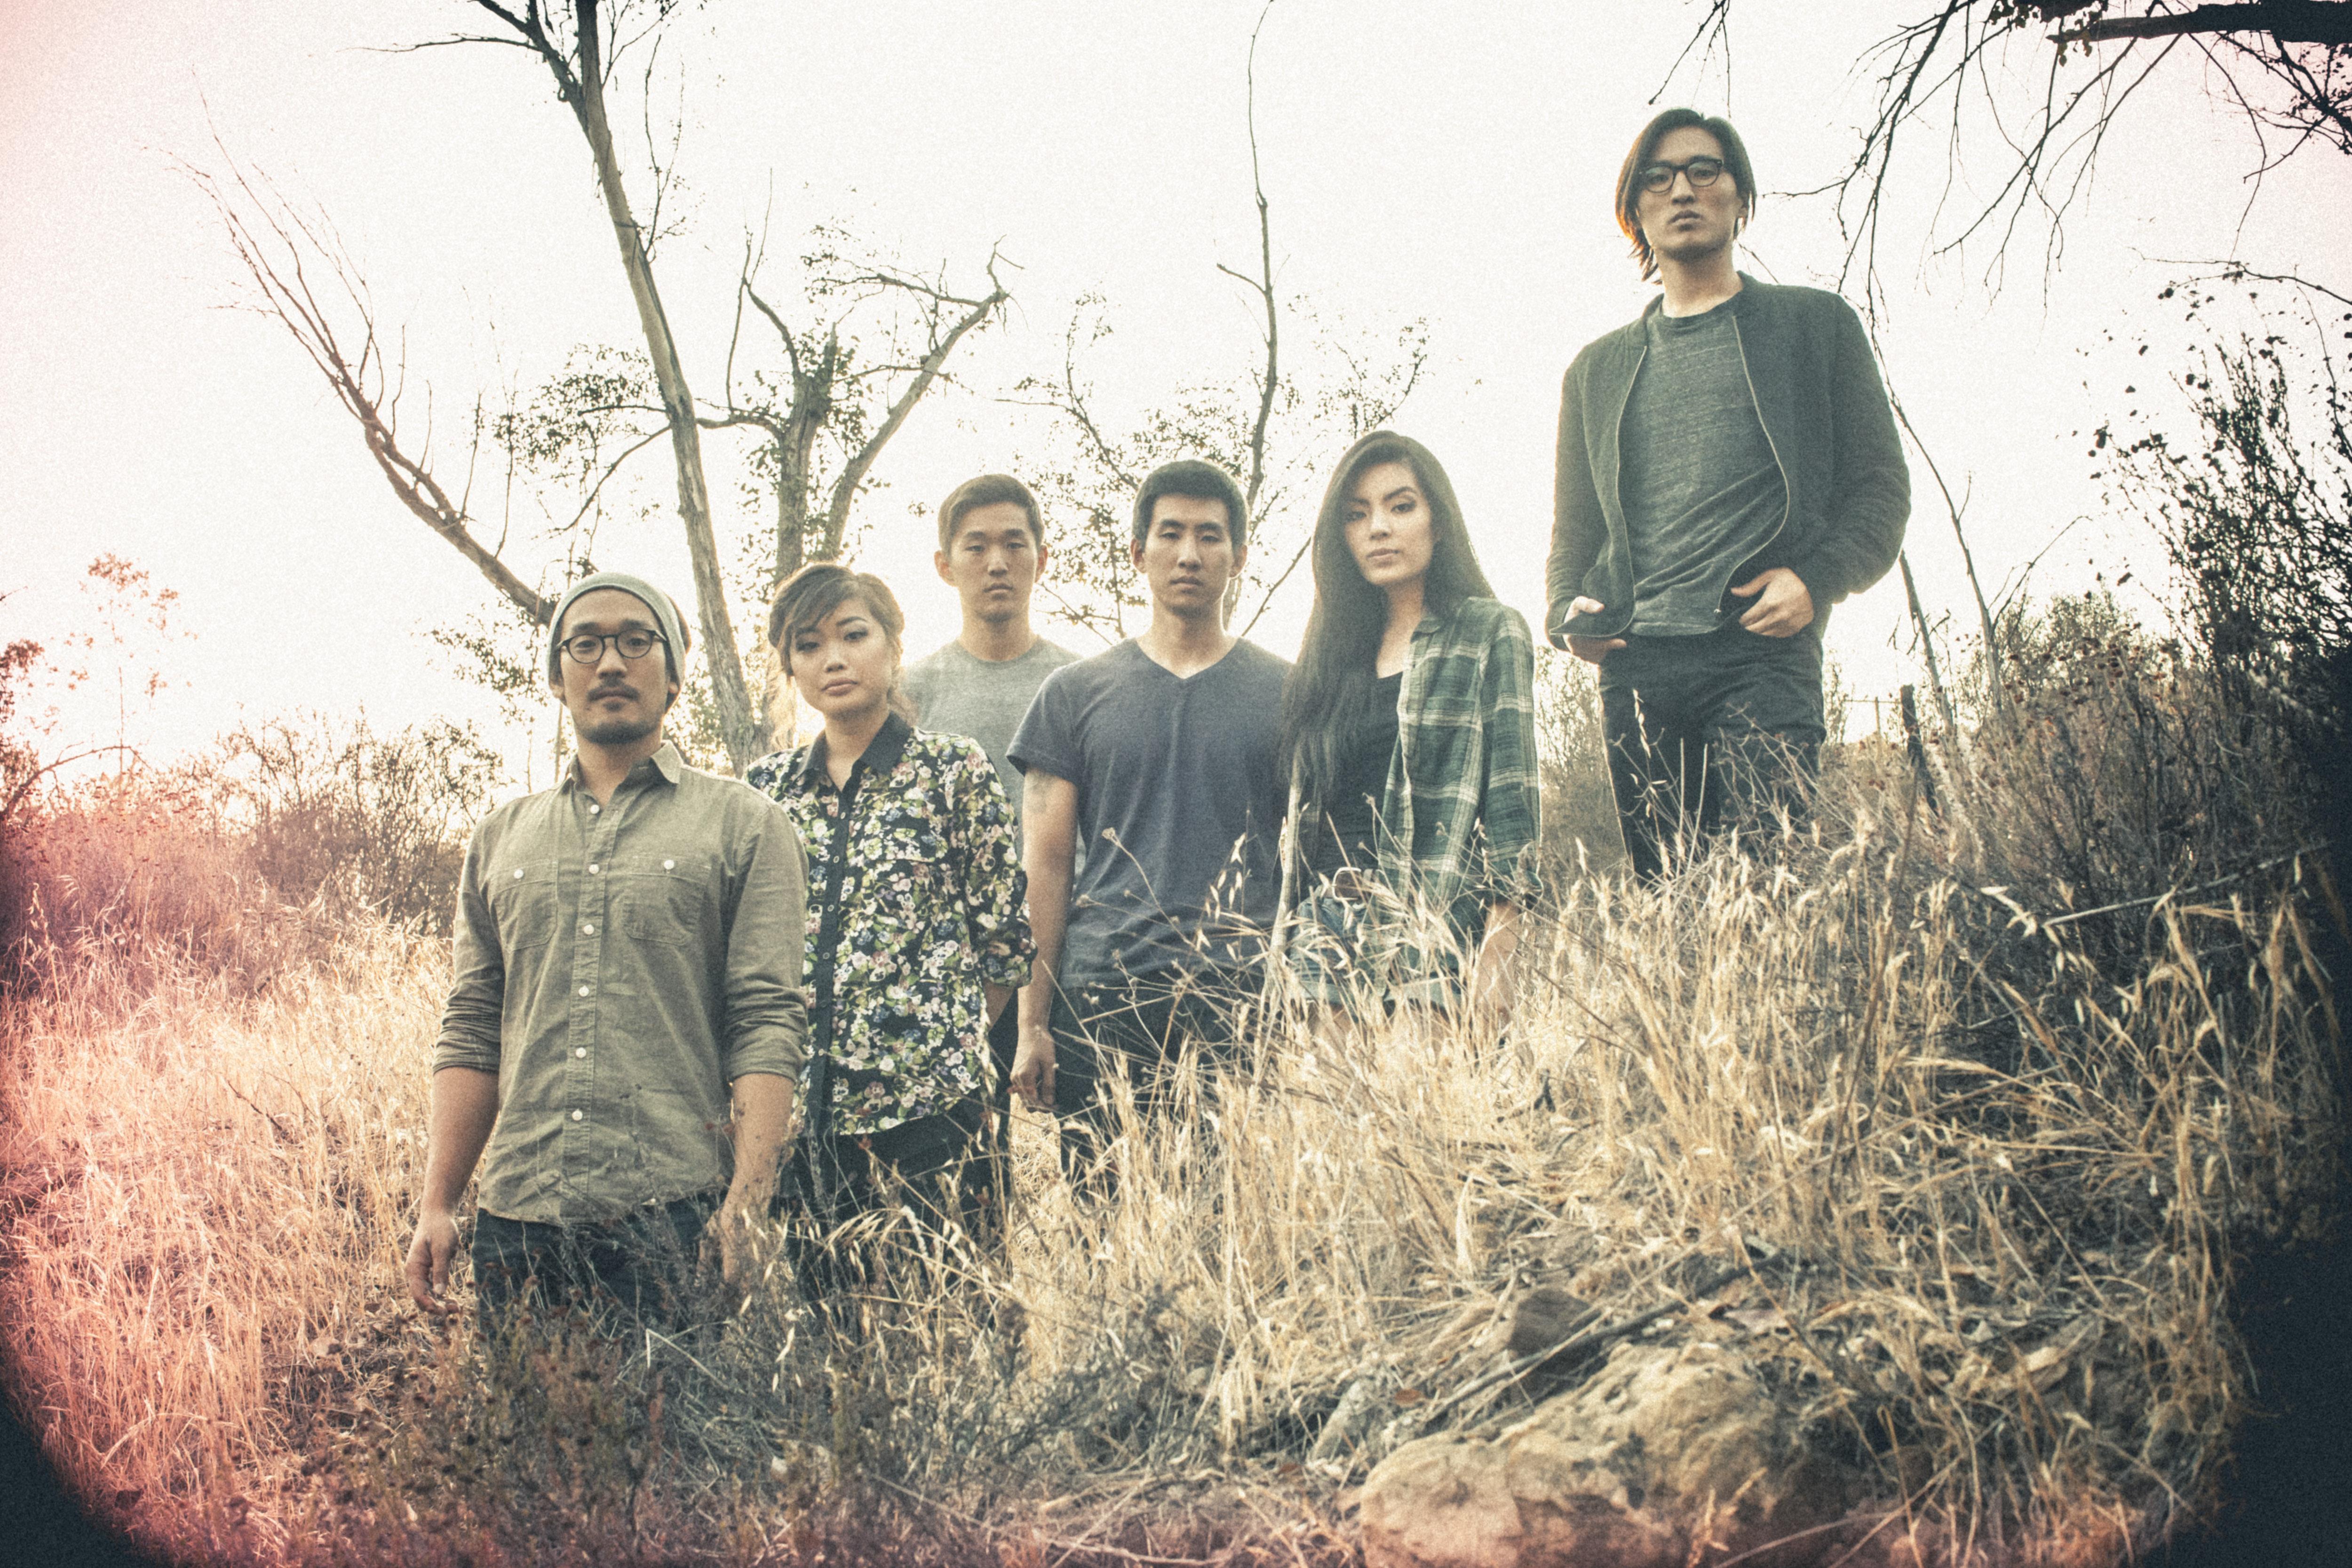 From left, Alex Hwang, Sally Kang, Daniel Chae, Joe Chun, Jennifer Rim, and John Chong of Run River North.